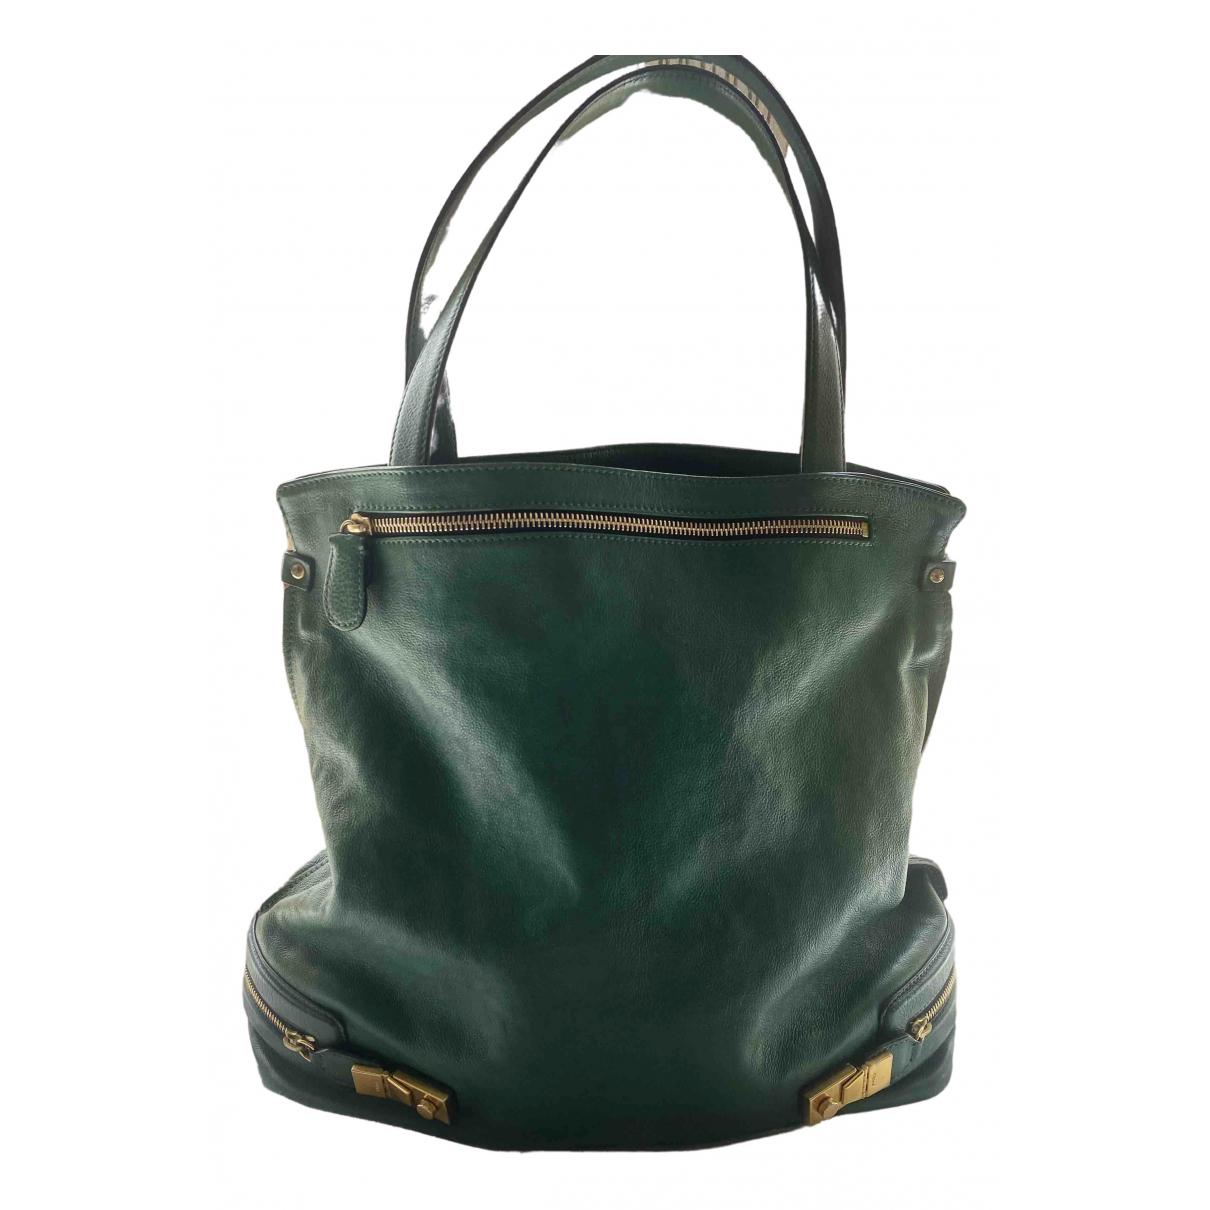 Chloé \N Green Leather handbag for Women \N